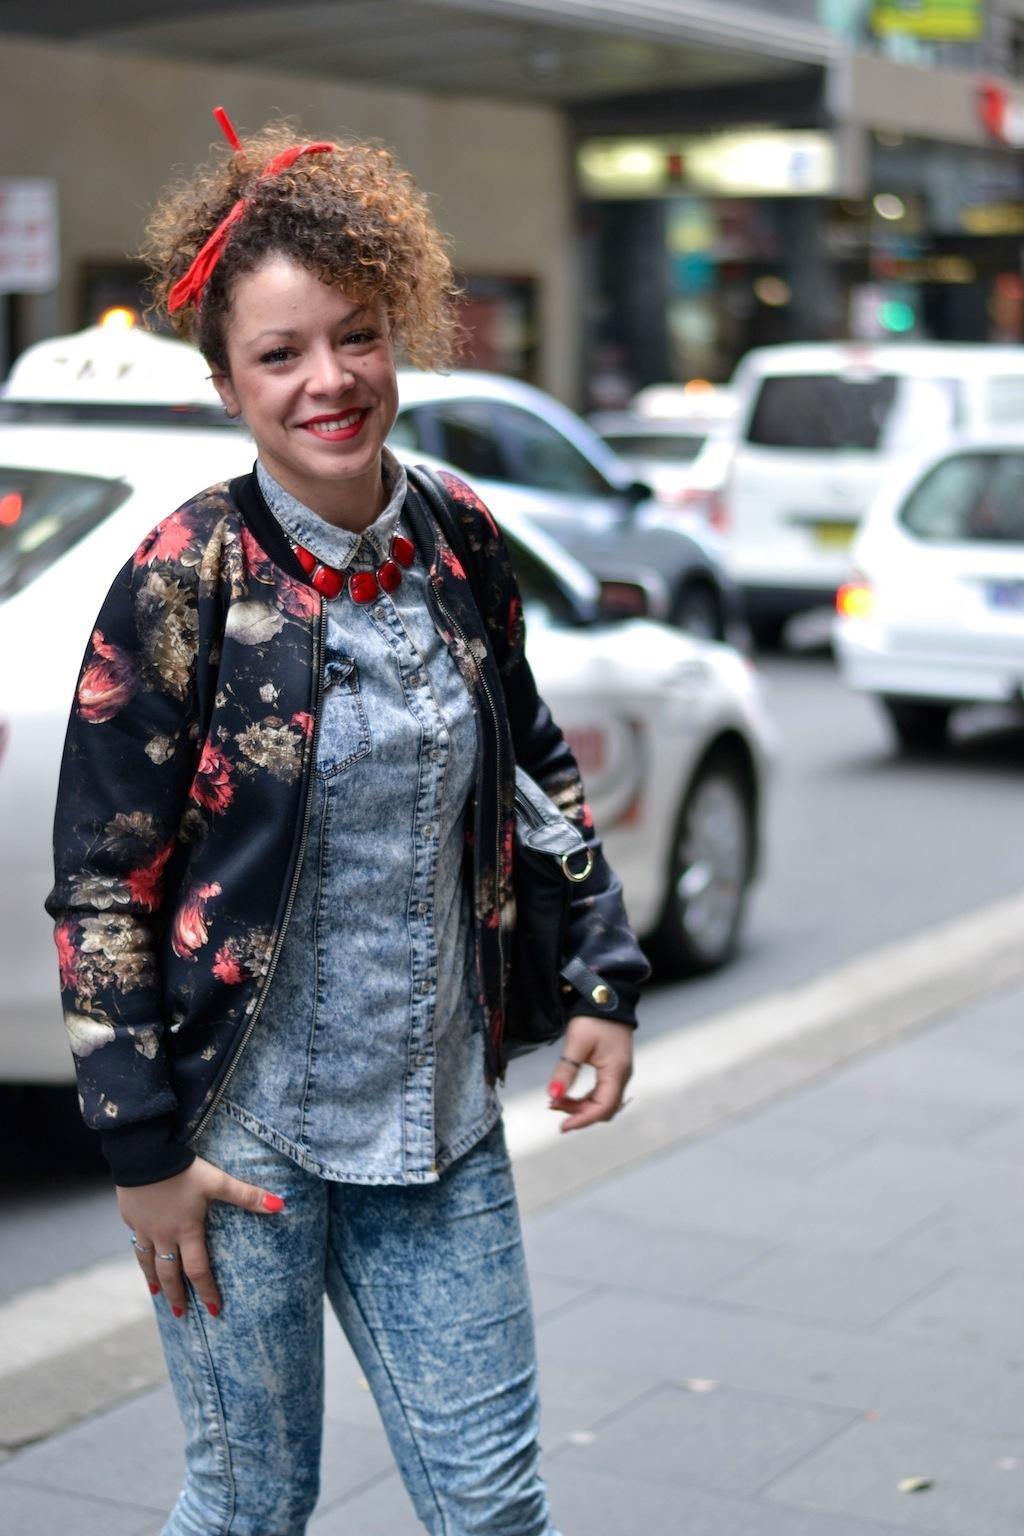 SA: Martina Mariani, hospitality, Chalmers St, Sydney. Photo: Alice Scriberras.